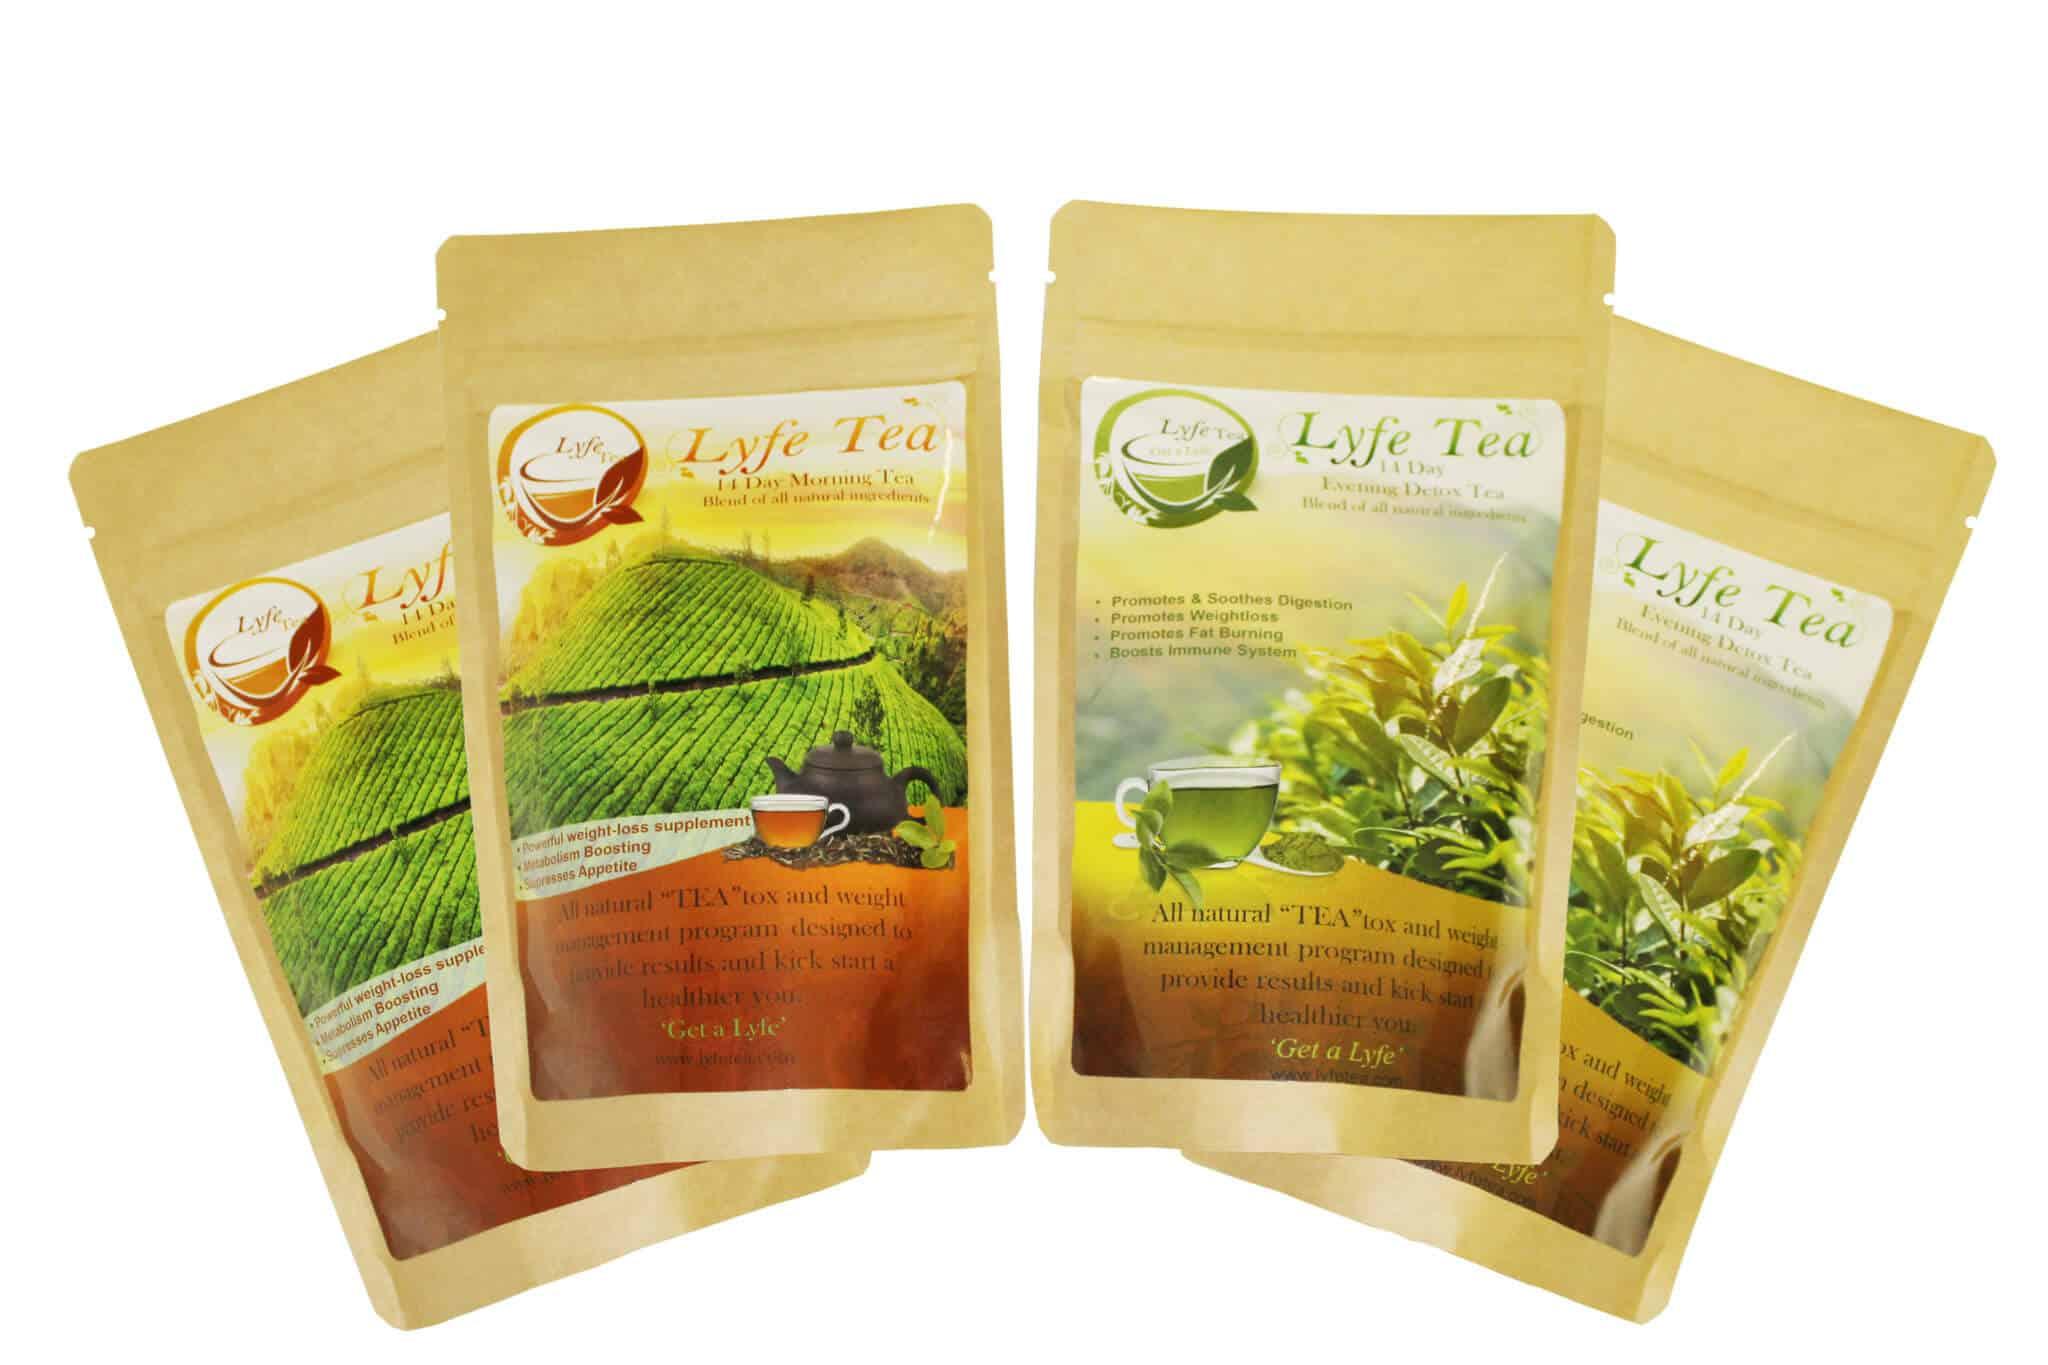 Triple leaf detox tea weight loss reviews